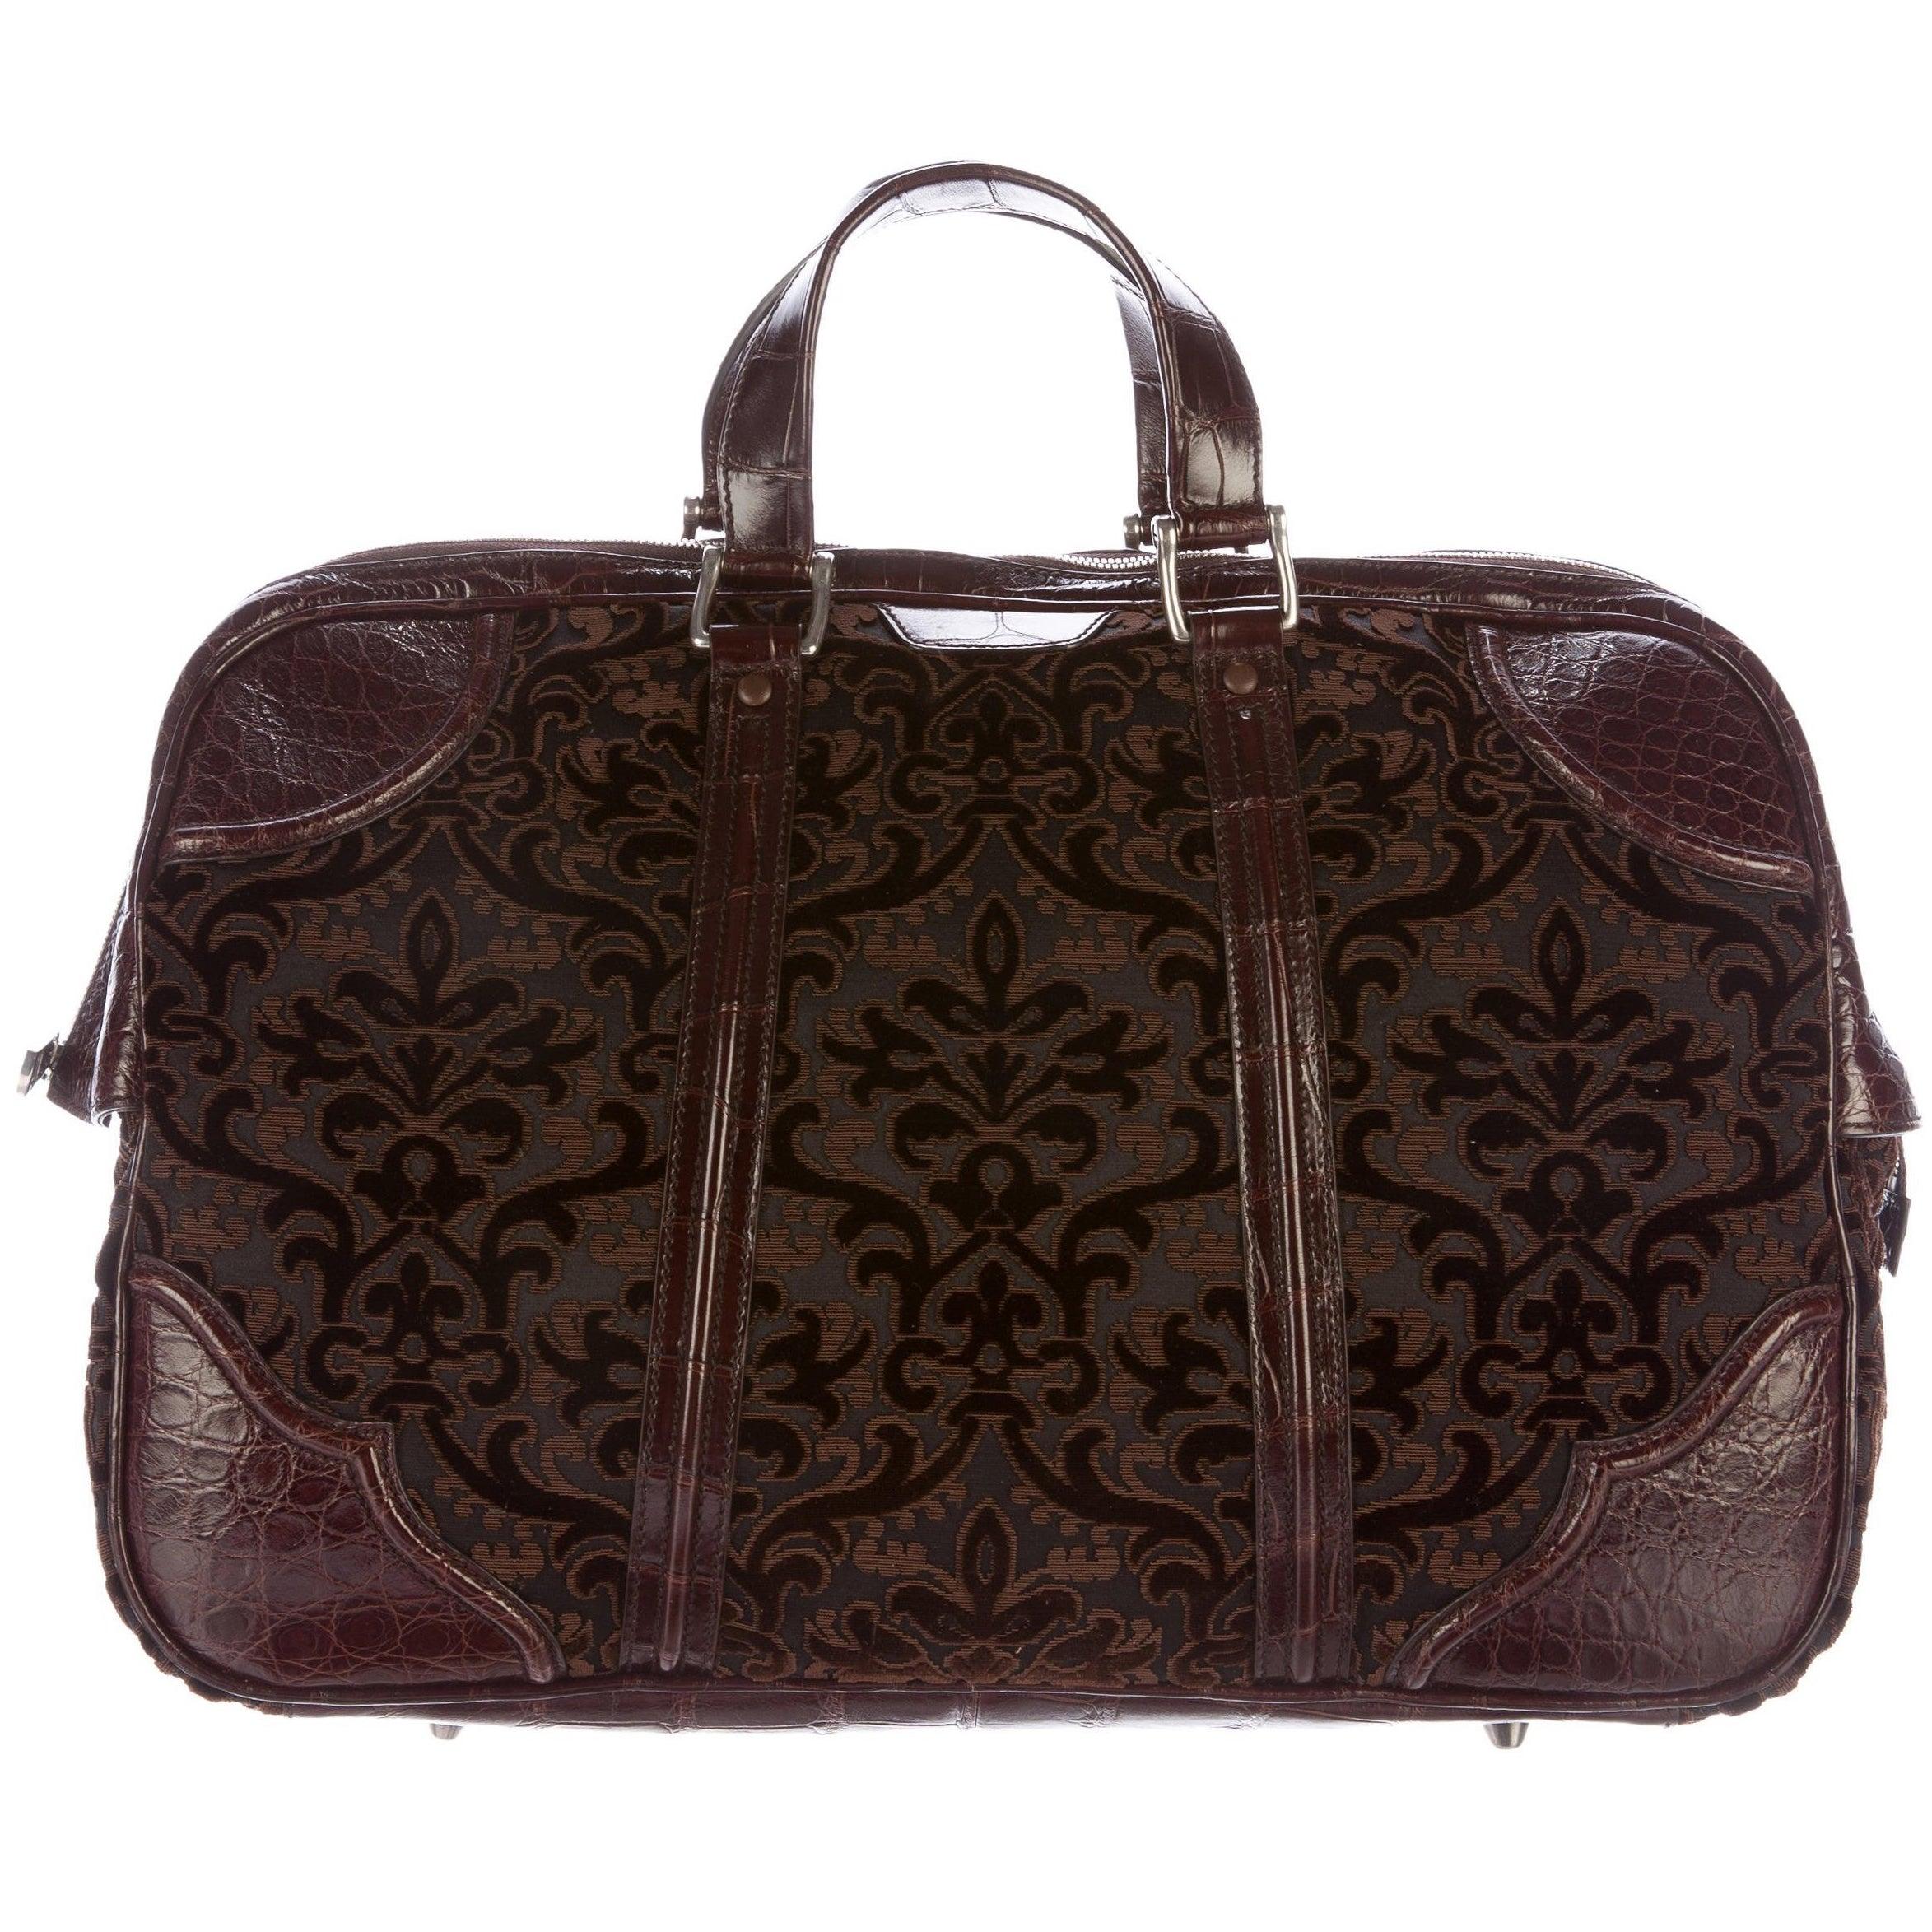 644c1dbce113 Gucci New Brown Crocodile Men s Women s Jacquard Weekender Top Handle Travel  Bag at 1stdibs